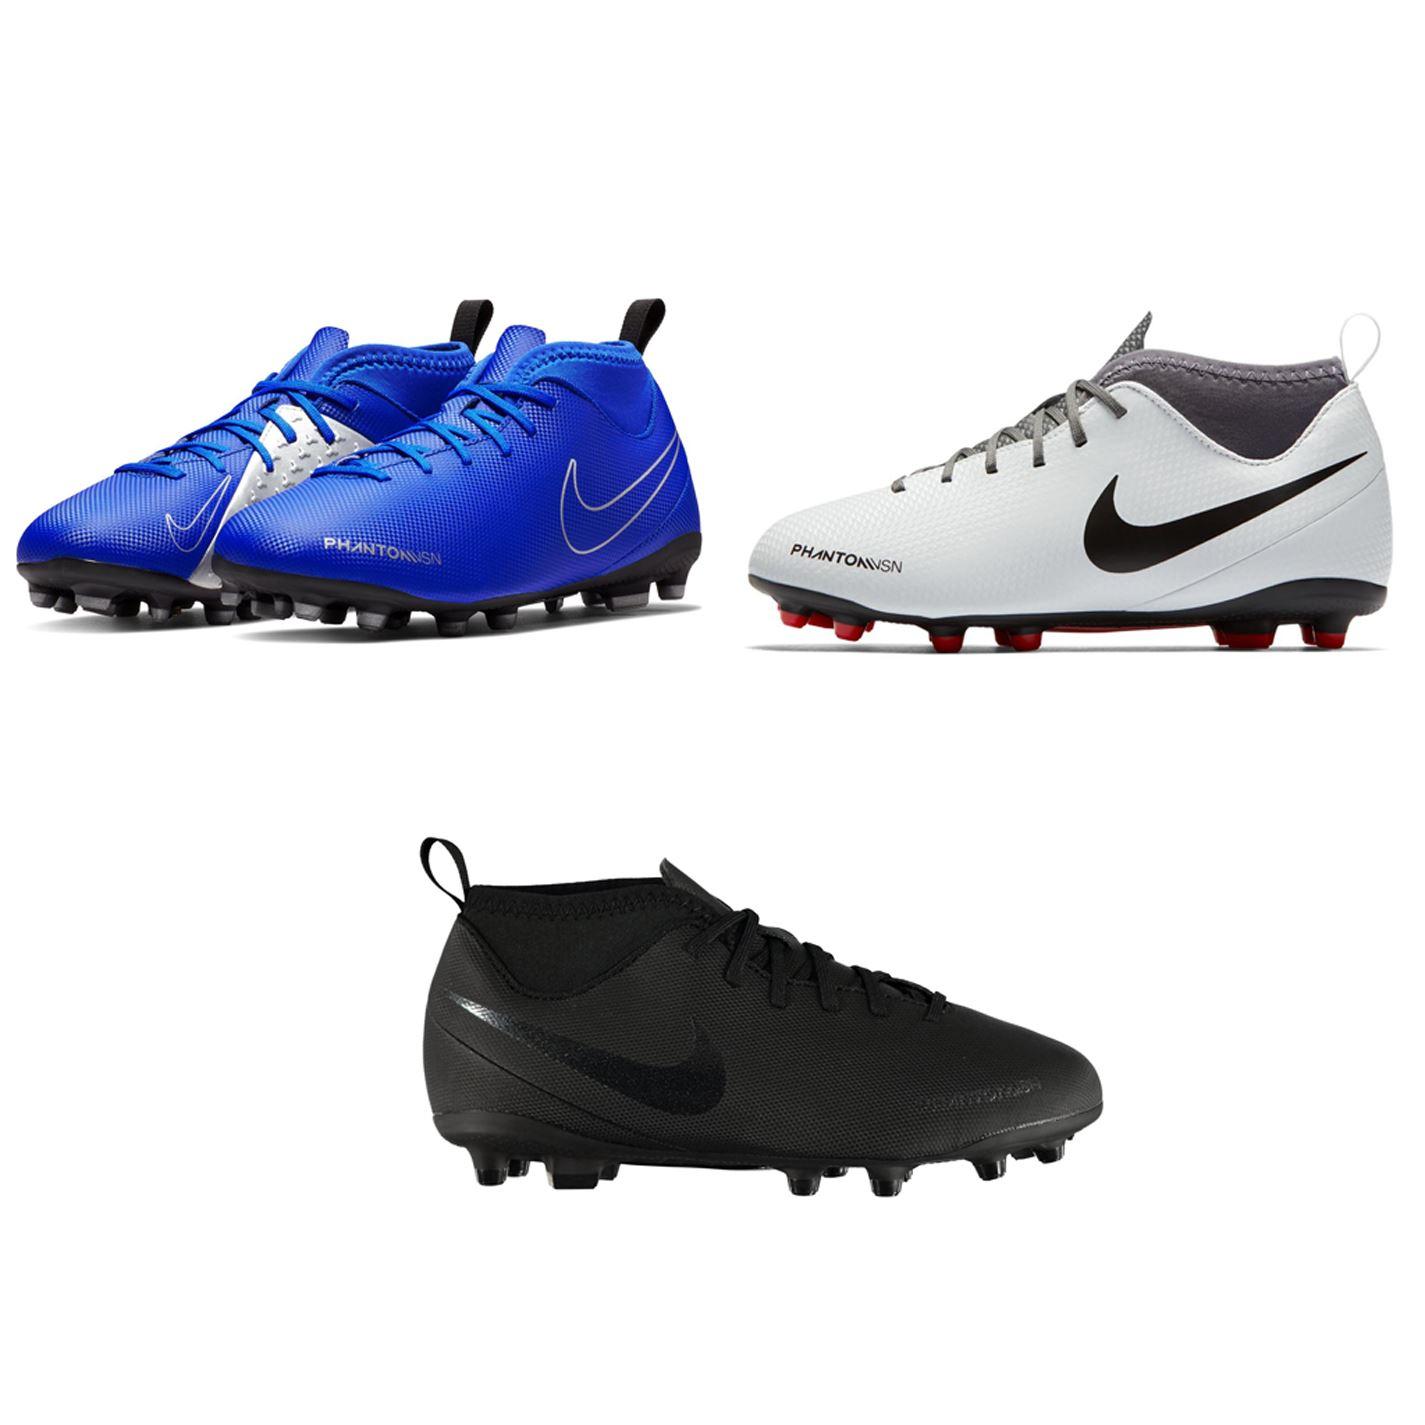 Nike Football Boots | Mercurial, Phantom| Pro:Direct Soccer